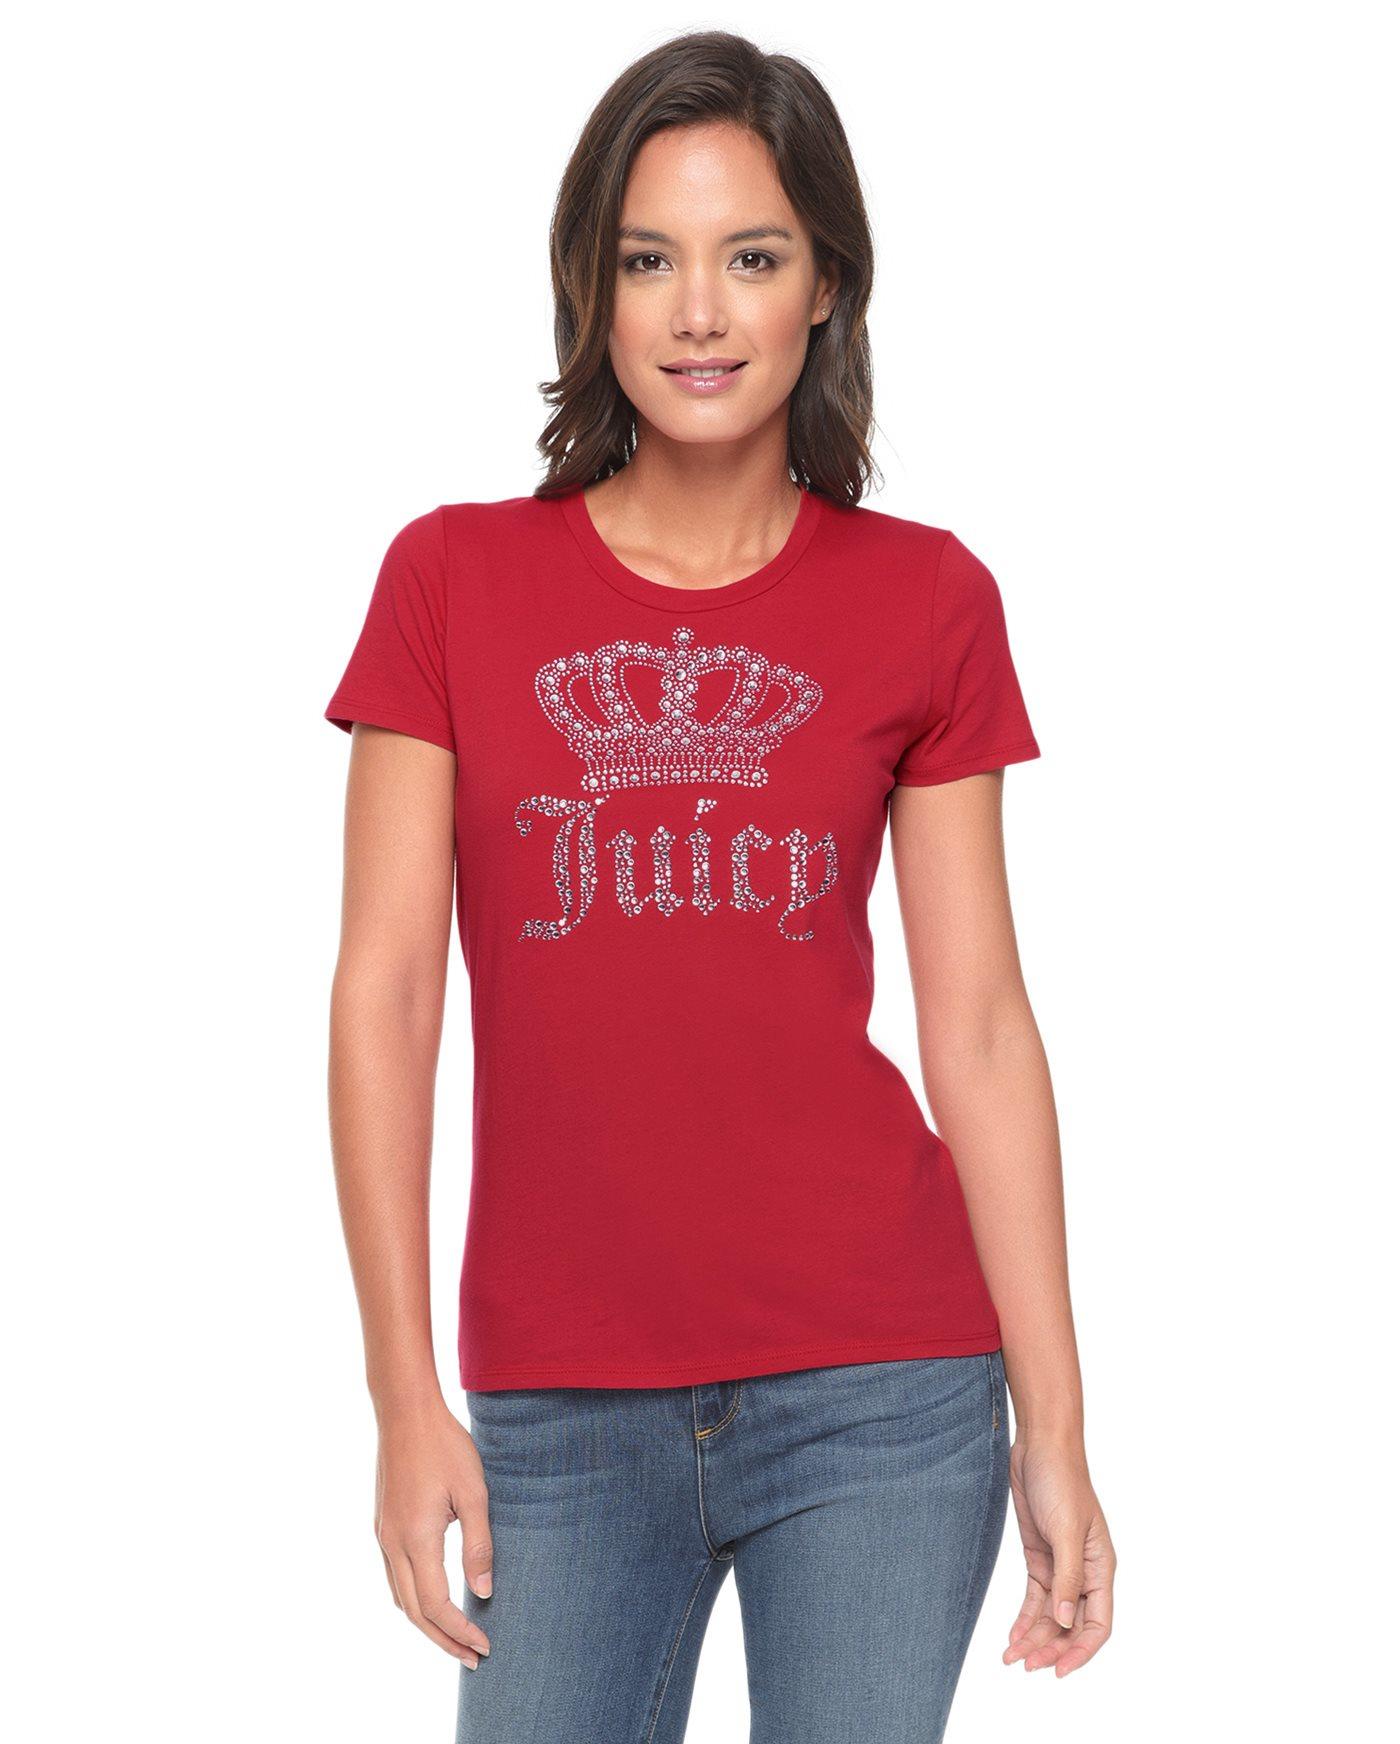 Juicy couture Logo Juicy Crown Short Sleeve Tee in Red ...Juicy Couture Crown Tattoo